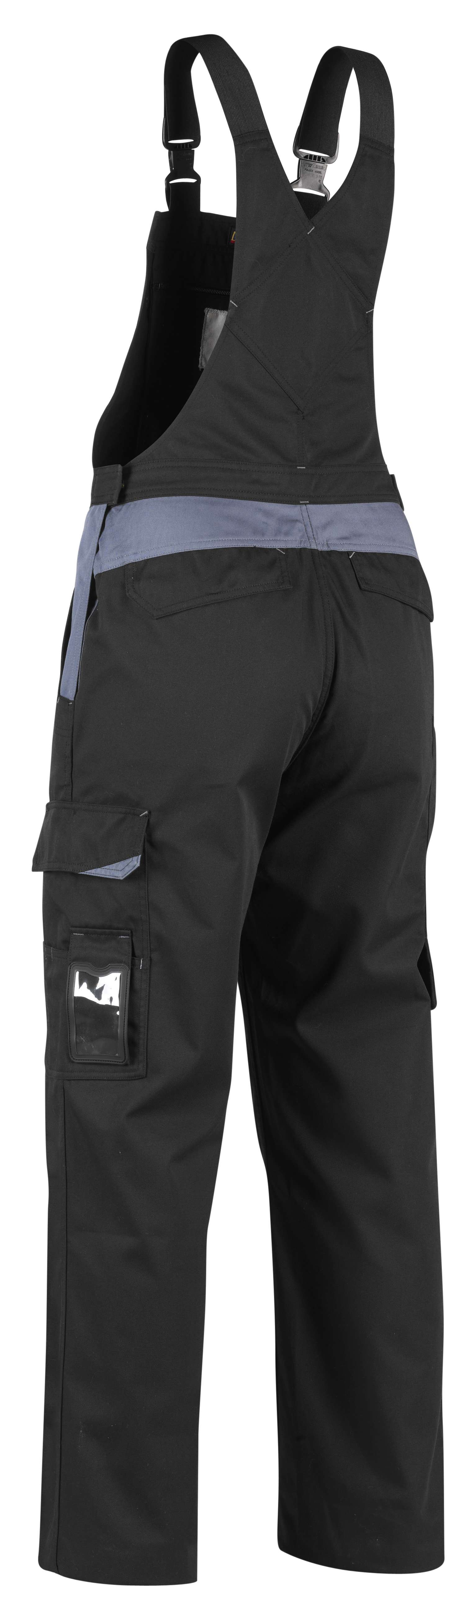 Blaklader Amerikaanse overalls 26651210 zwart-grijs(9994)